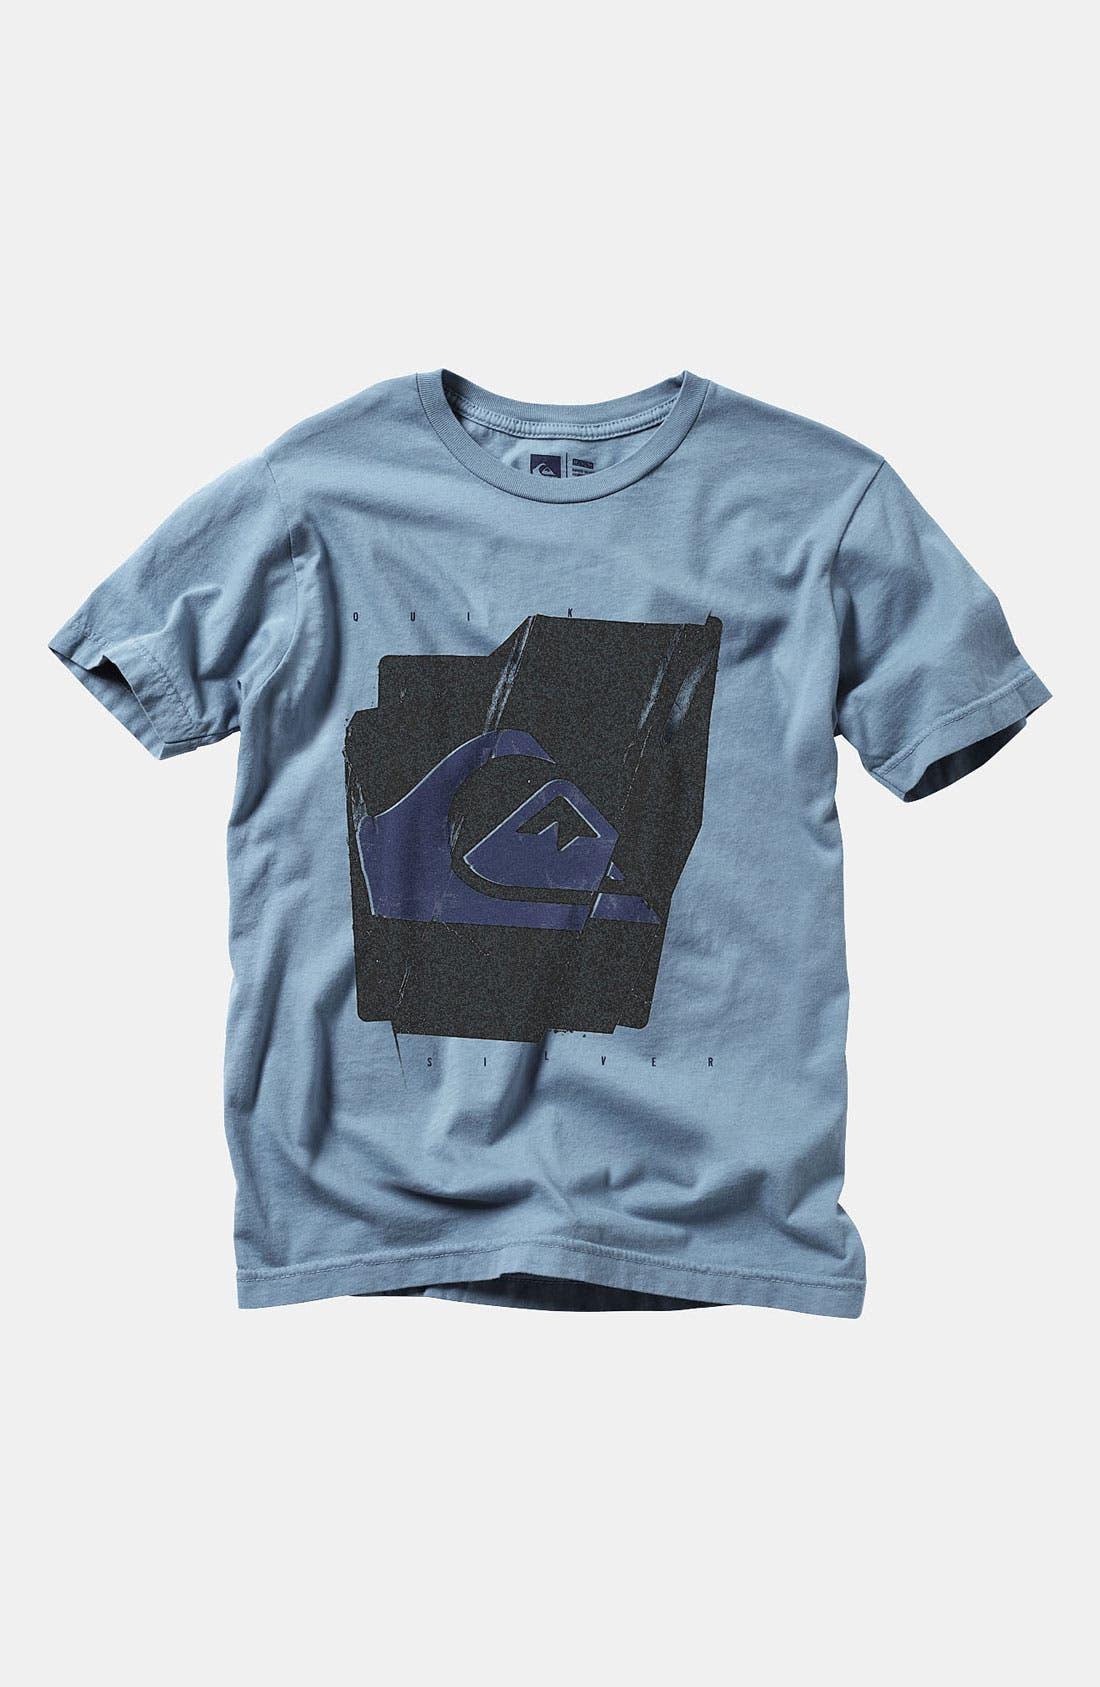 Alternate Image 1 Selected - Quiksilver 'Disregard' T-Shirt (Big Boys)